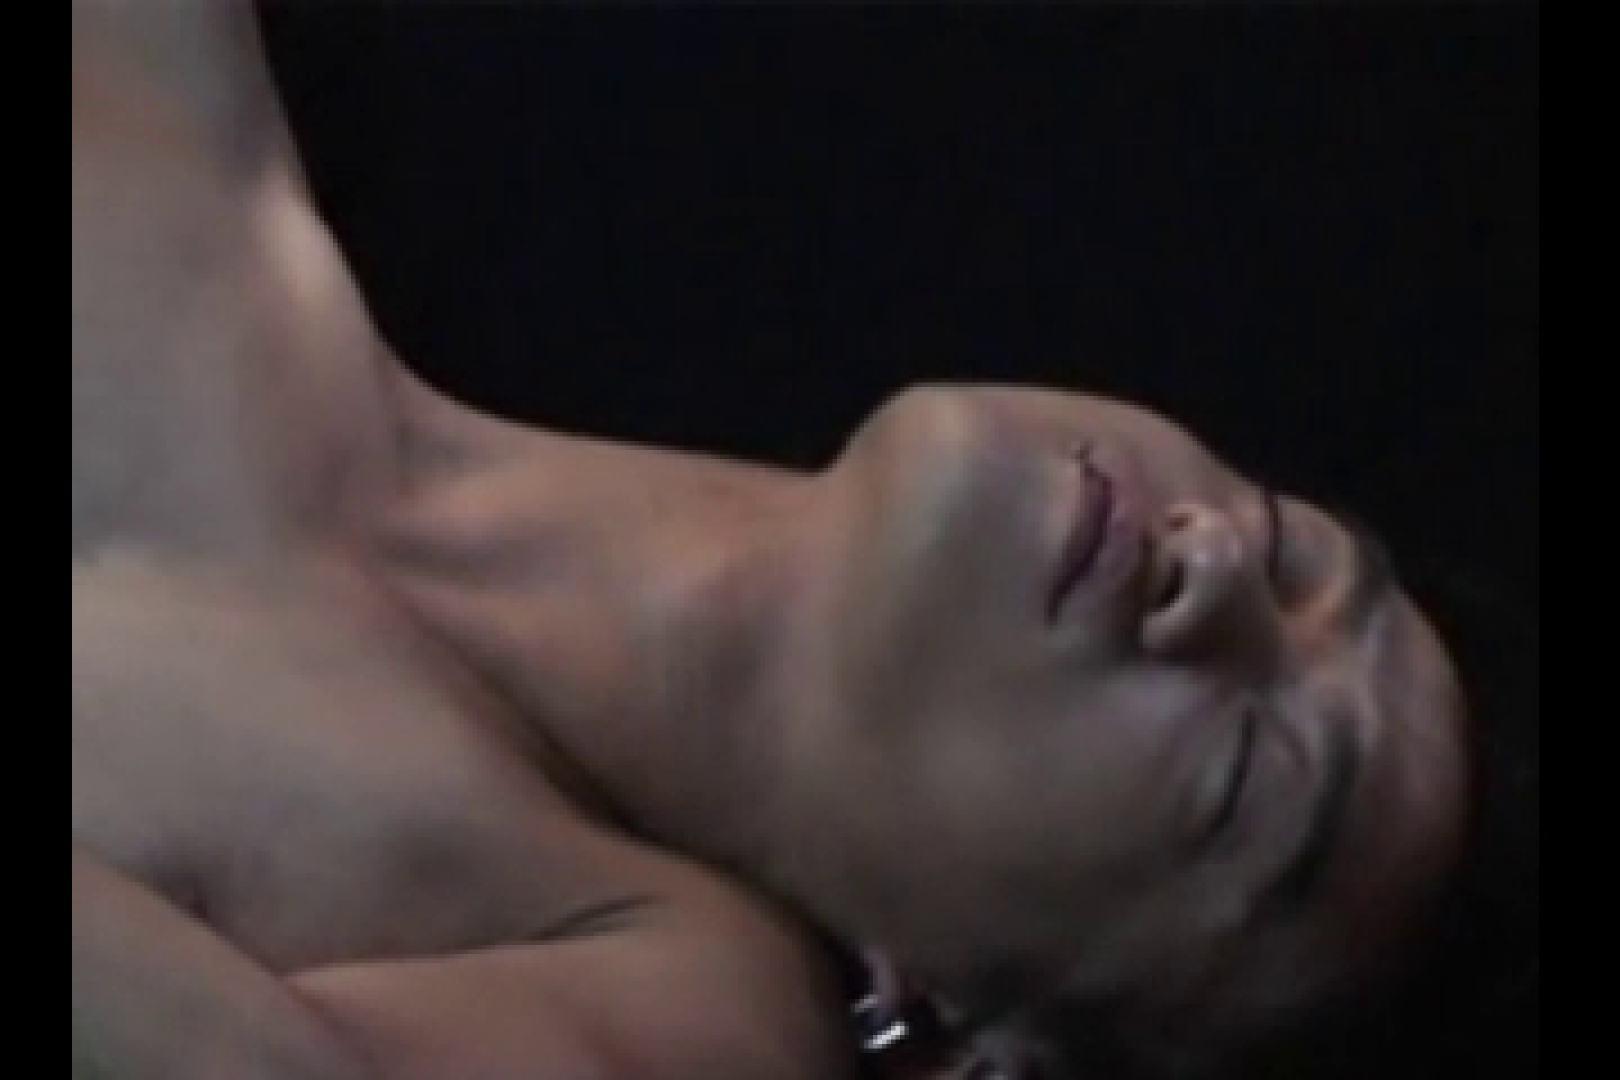 ASIAN BOY Vol.04 私服がかっこいい ゲイえろ動画紹介 100枚 84